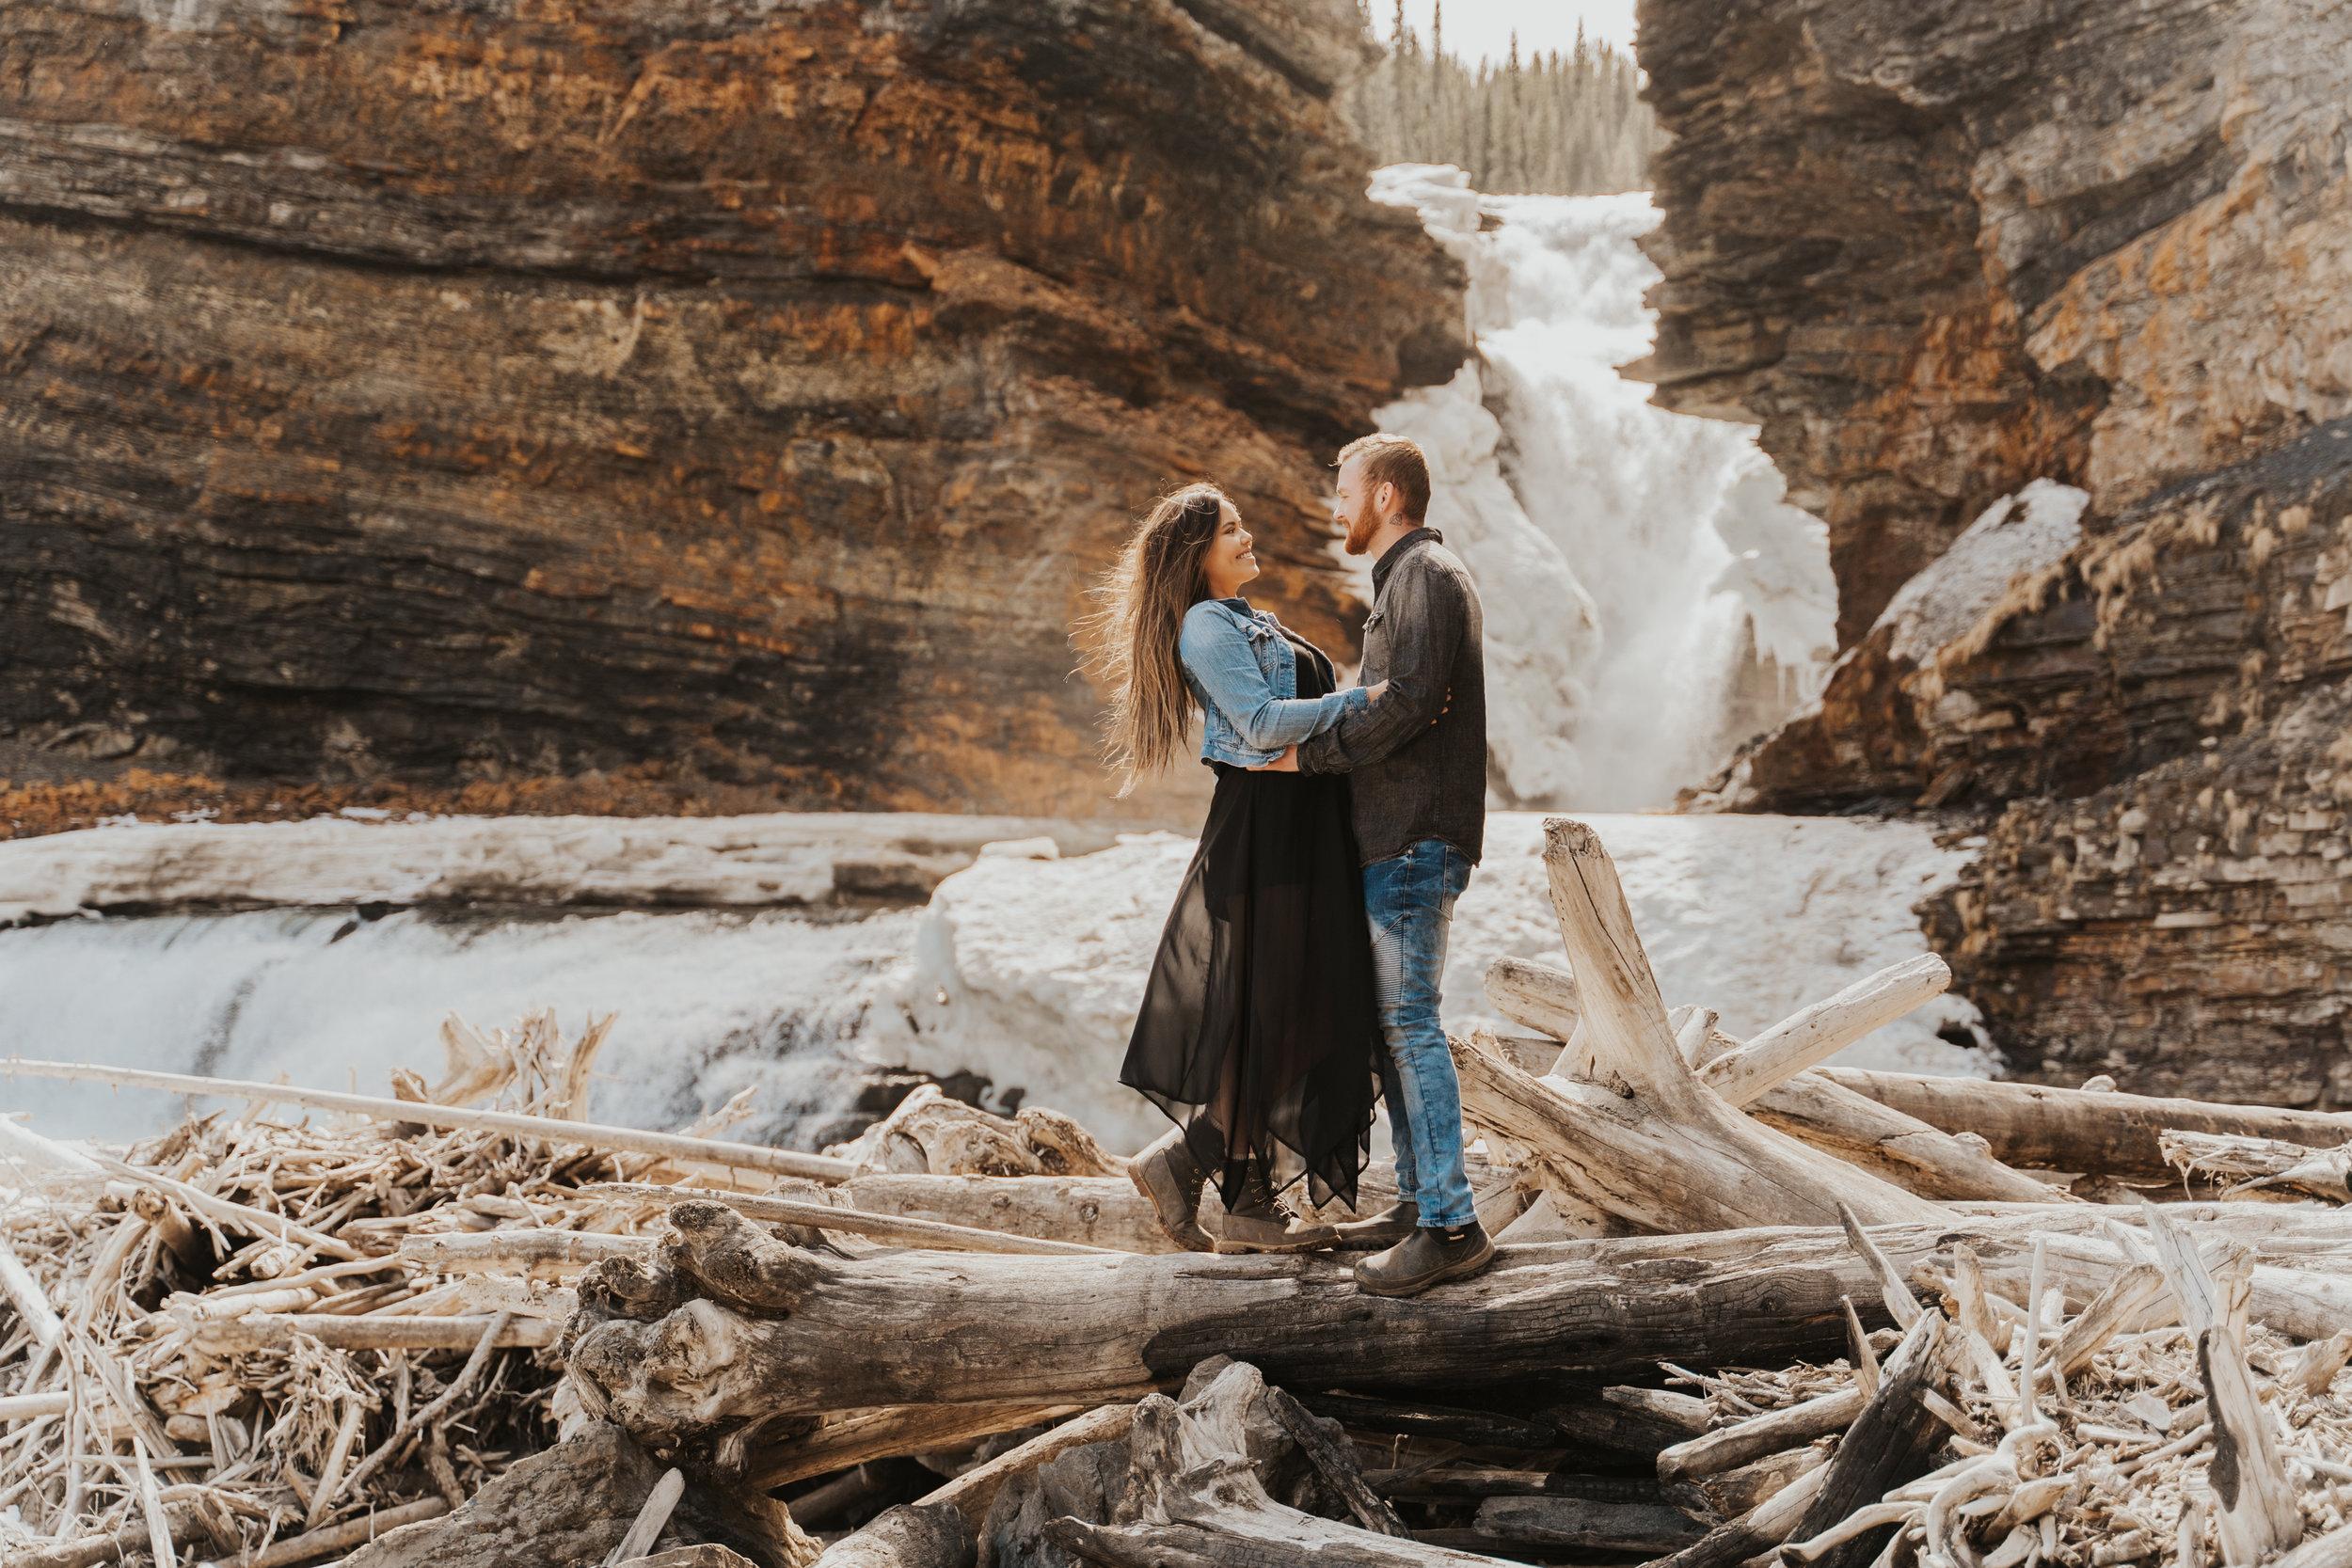 tyraephotography_photographer_wedding_elopement_engagement_photography-04388.jpg